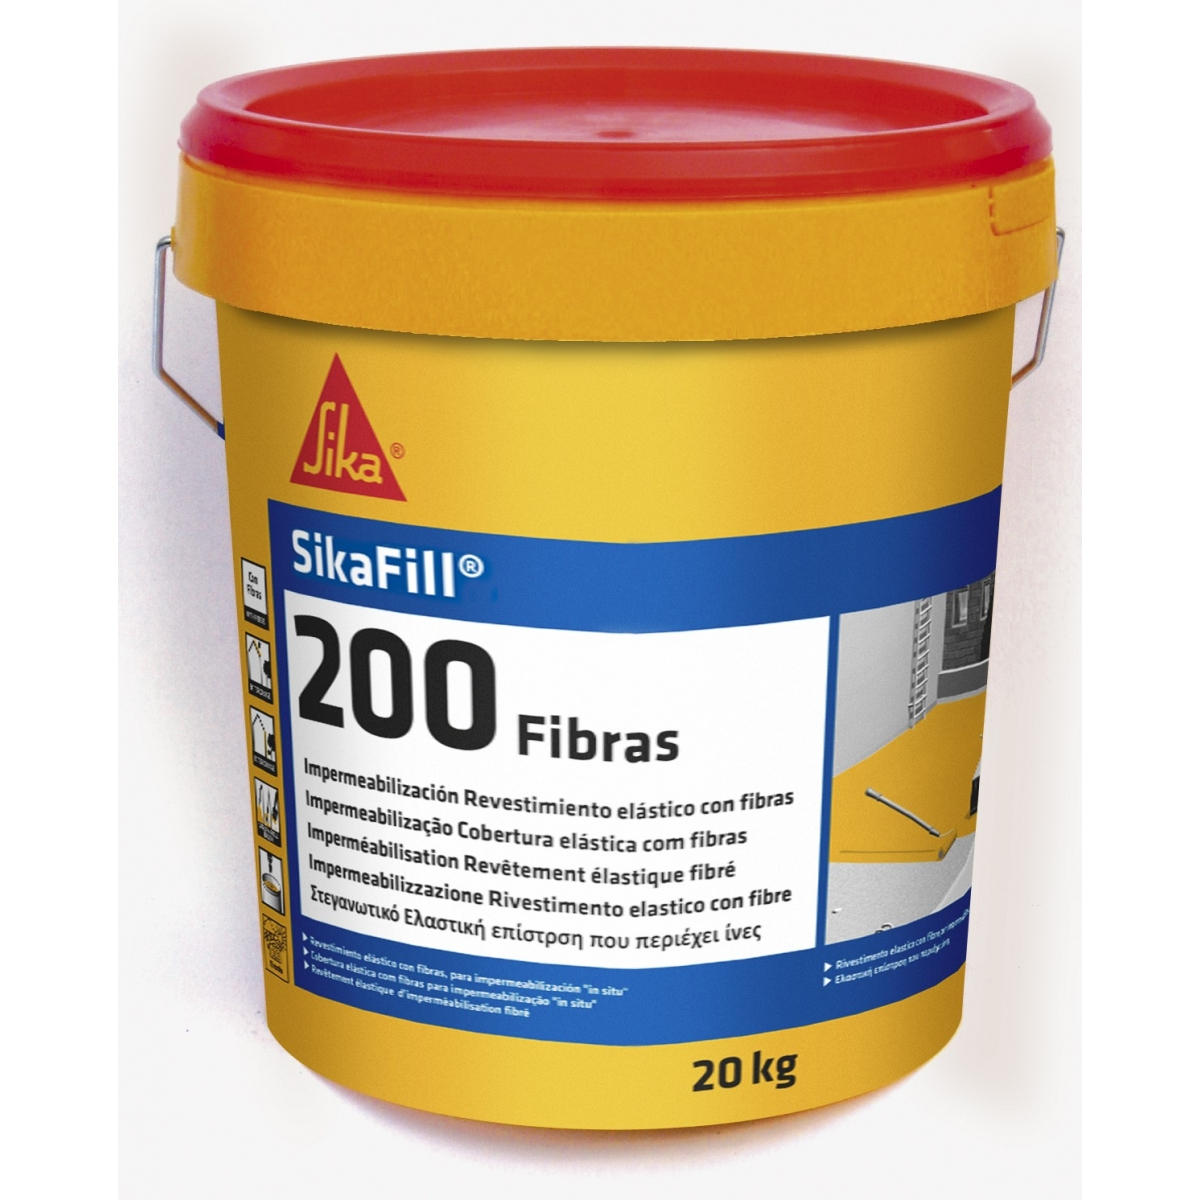 Sikafill 200 Fibras 20kg - Terrazas, balcones y azoteas - Marca Sika